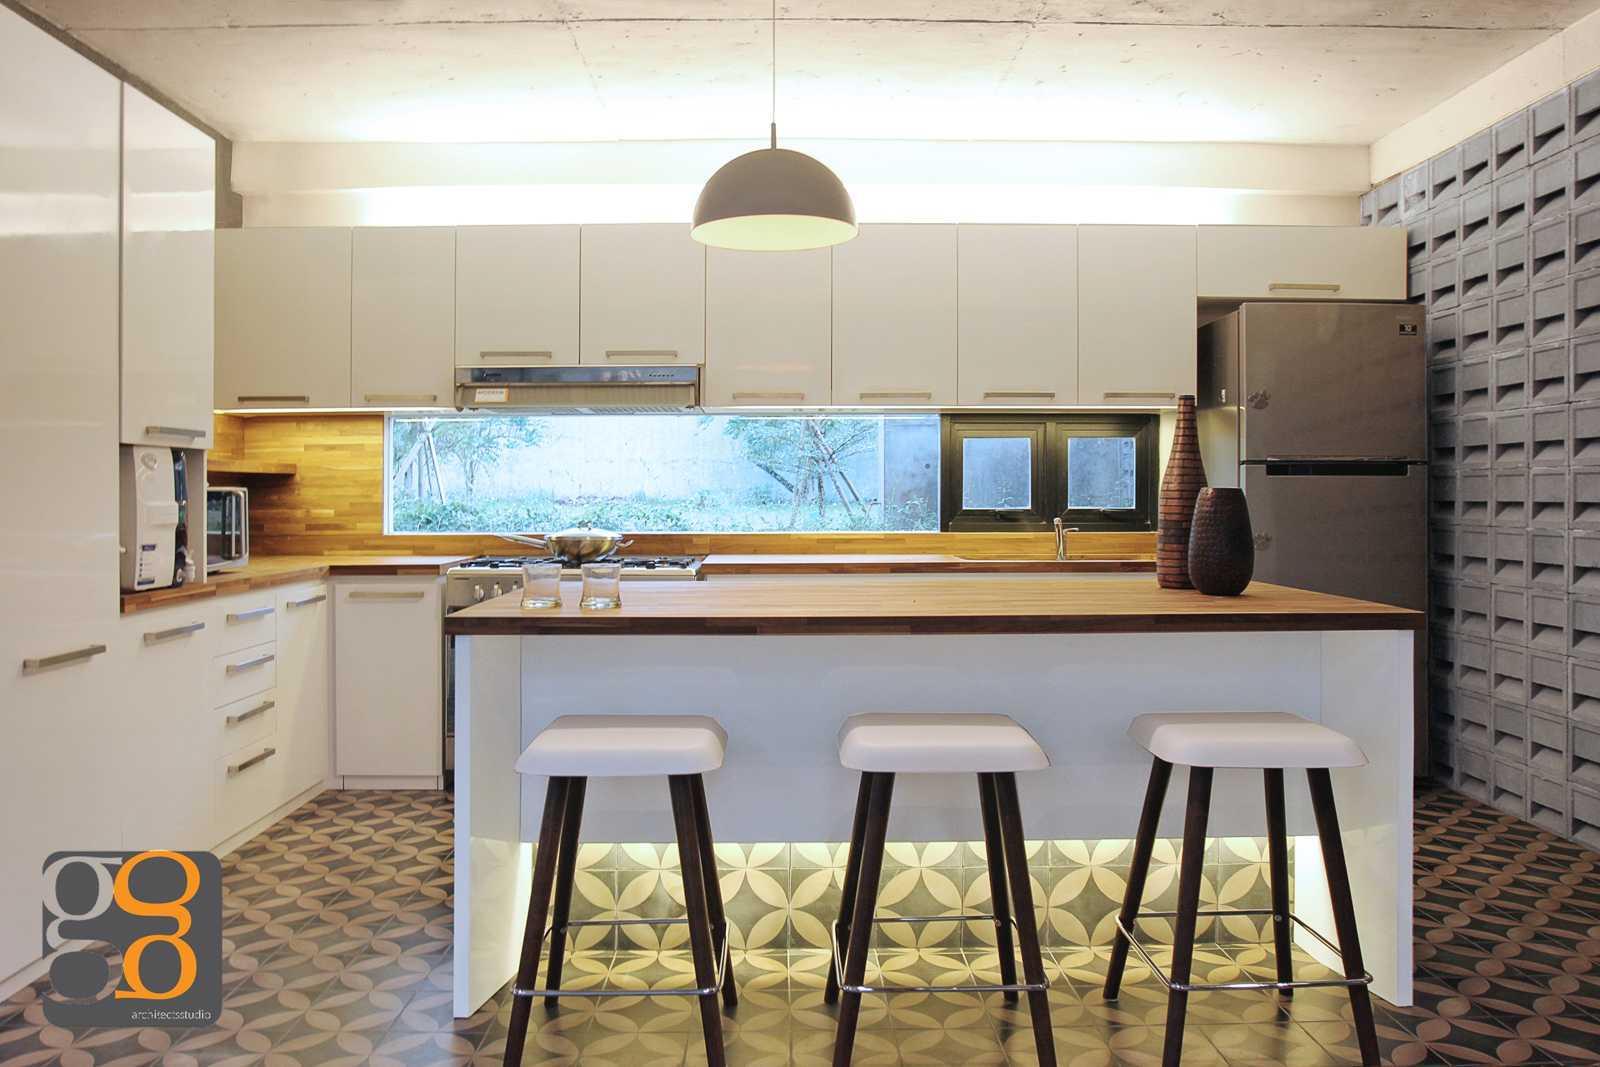 G+G Architect Studio H & I House Kota Wisata - Cibubur Kota Wisata - Cibubur Architecture-Cibubur-House-8 Industrial,wood  26941